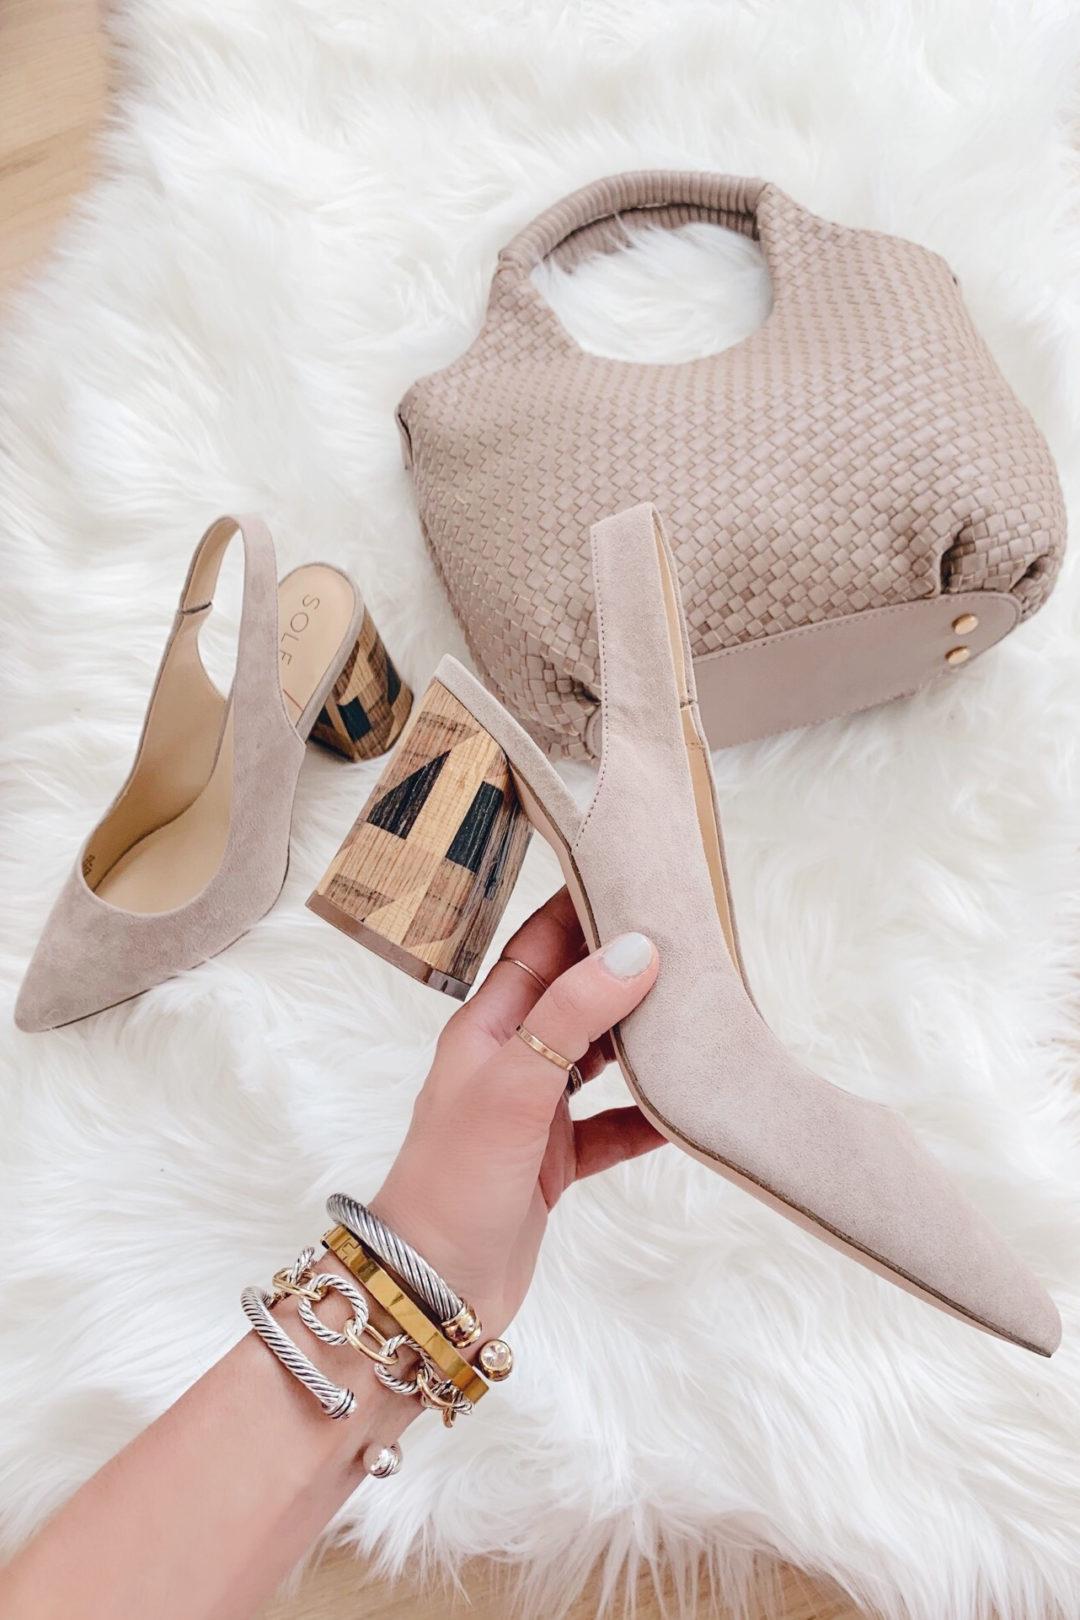 taupe suede block heel pumps and taupe handbag - pinteresting plans blog